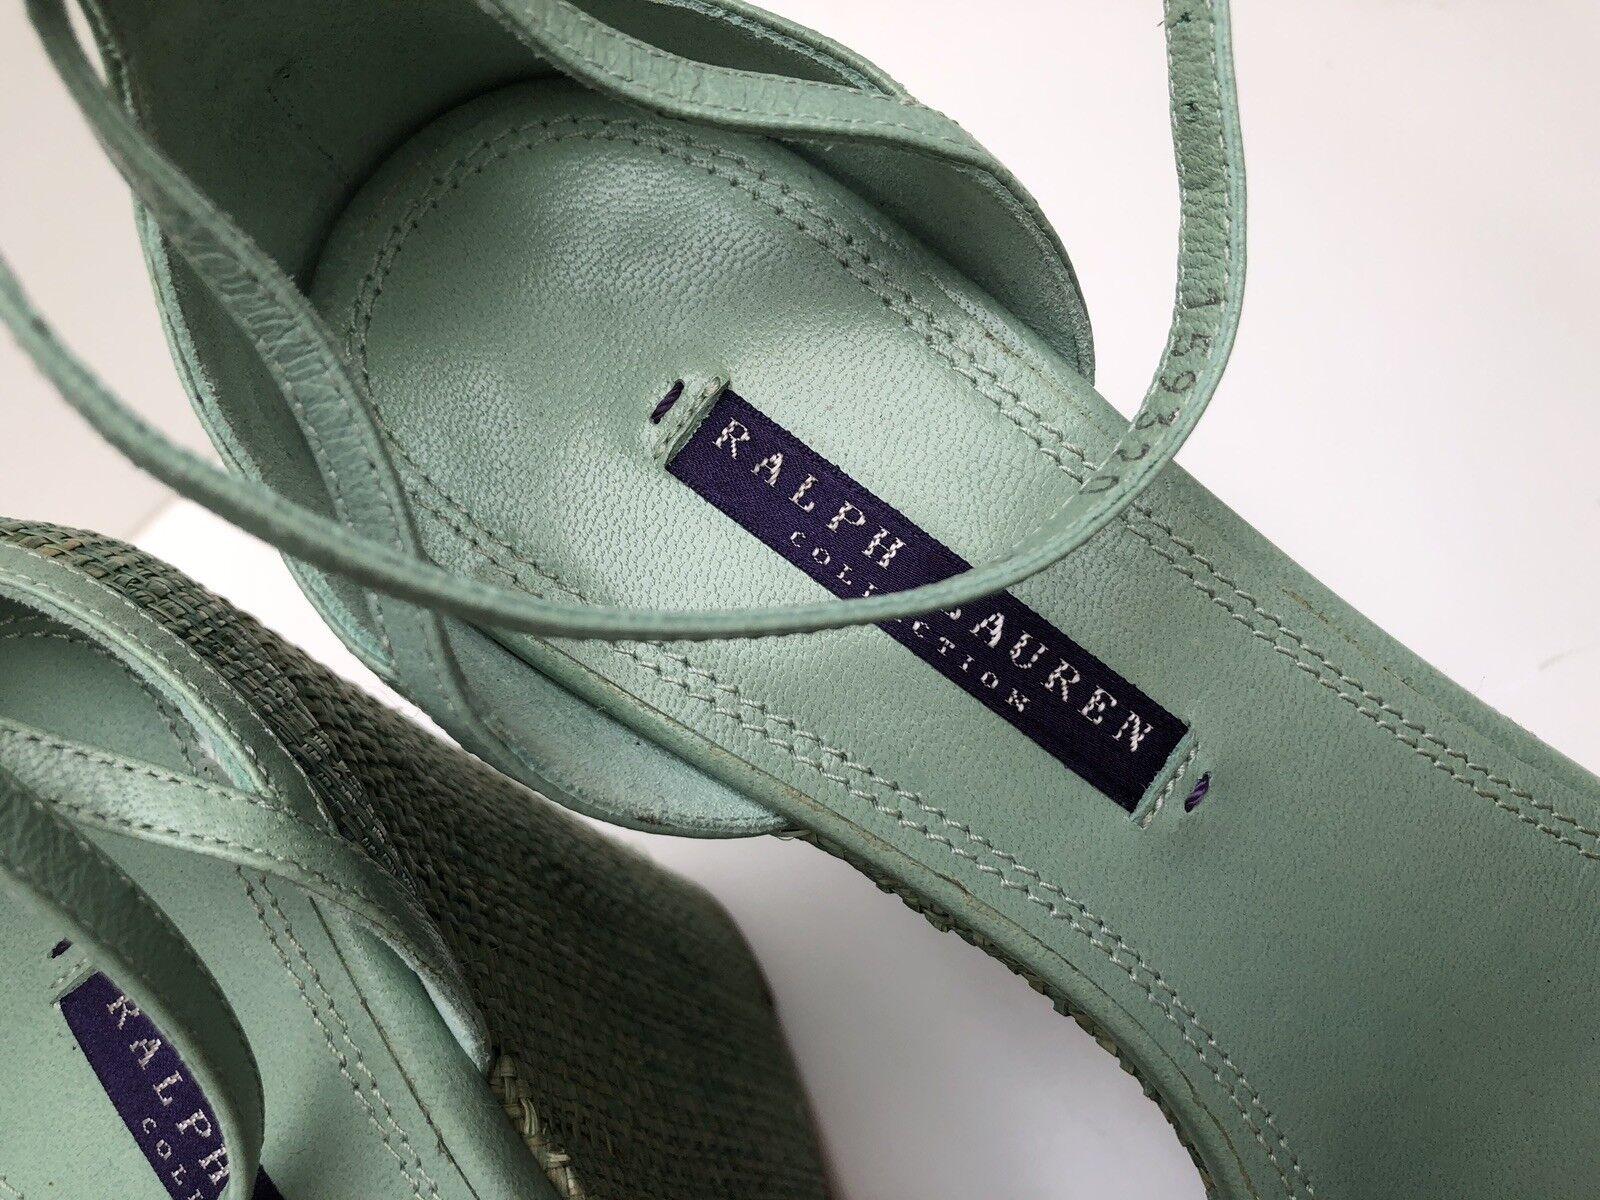 Ralph Lauren eriana Alpargatas Sandalia Tacones Tacones Tacones Altos-verde Reino Unido 6.5  PVP   Nuevo 8f130b